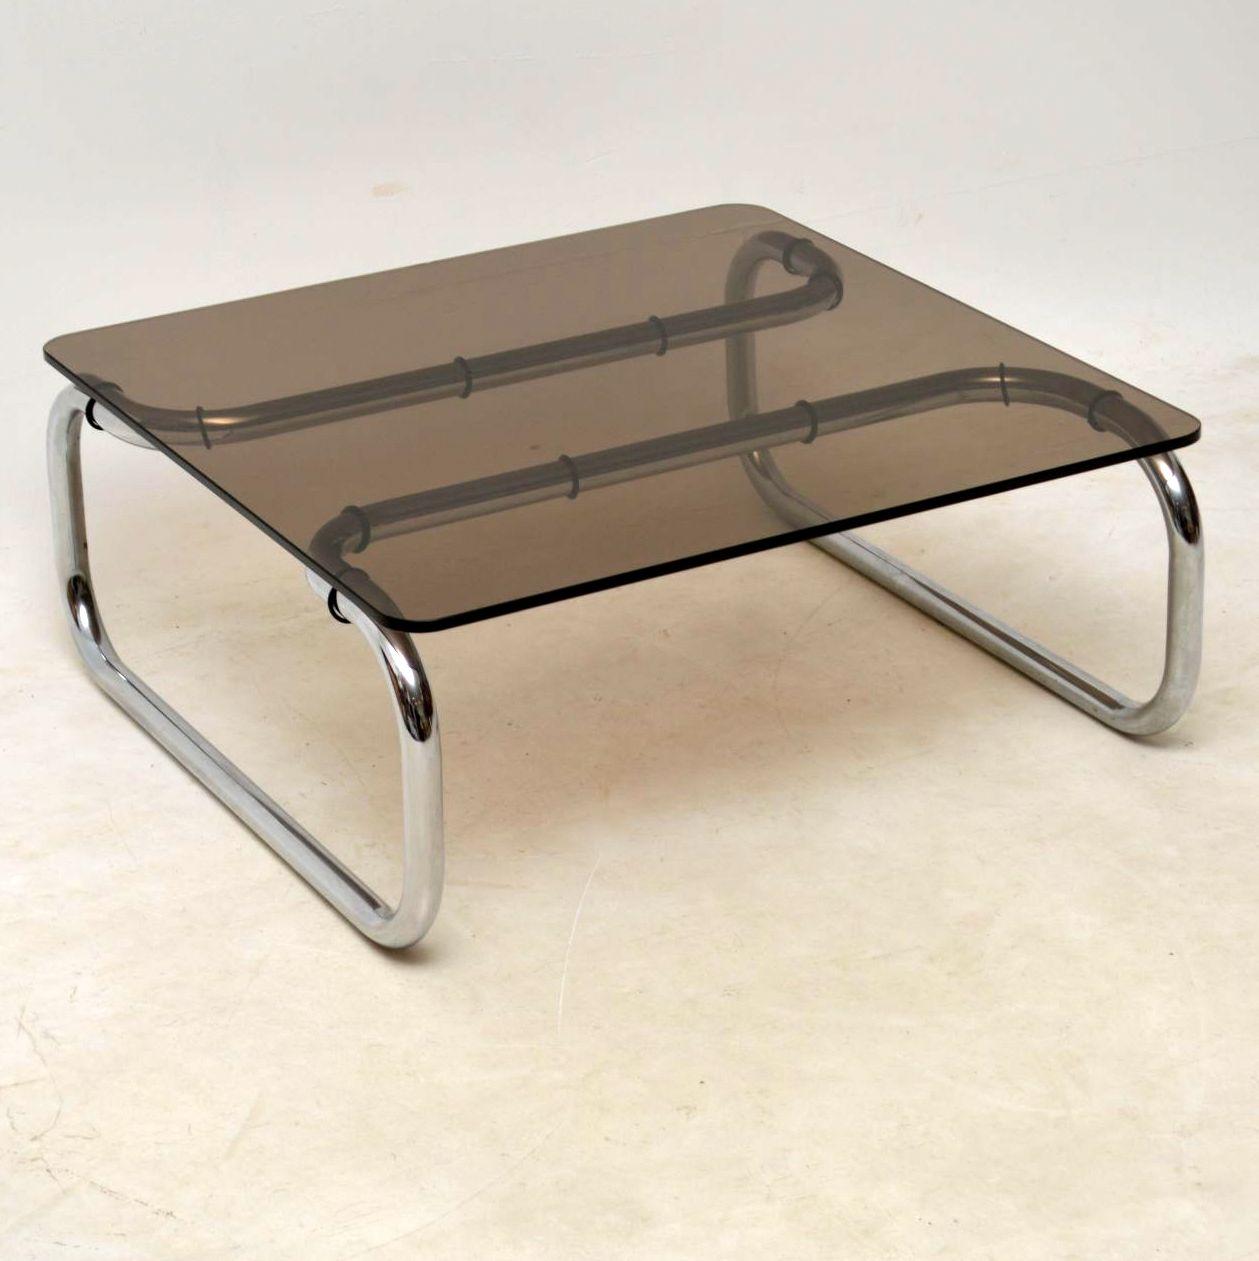 1960's Chrome & Glass Vintage Coffee Table By Rodney